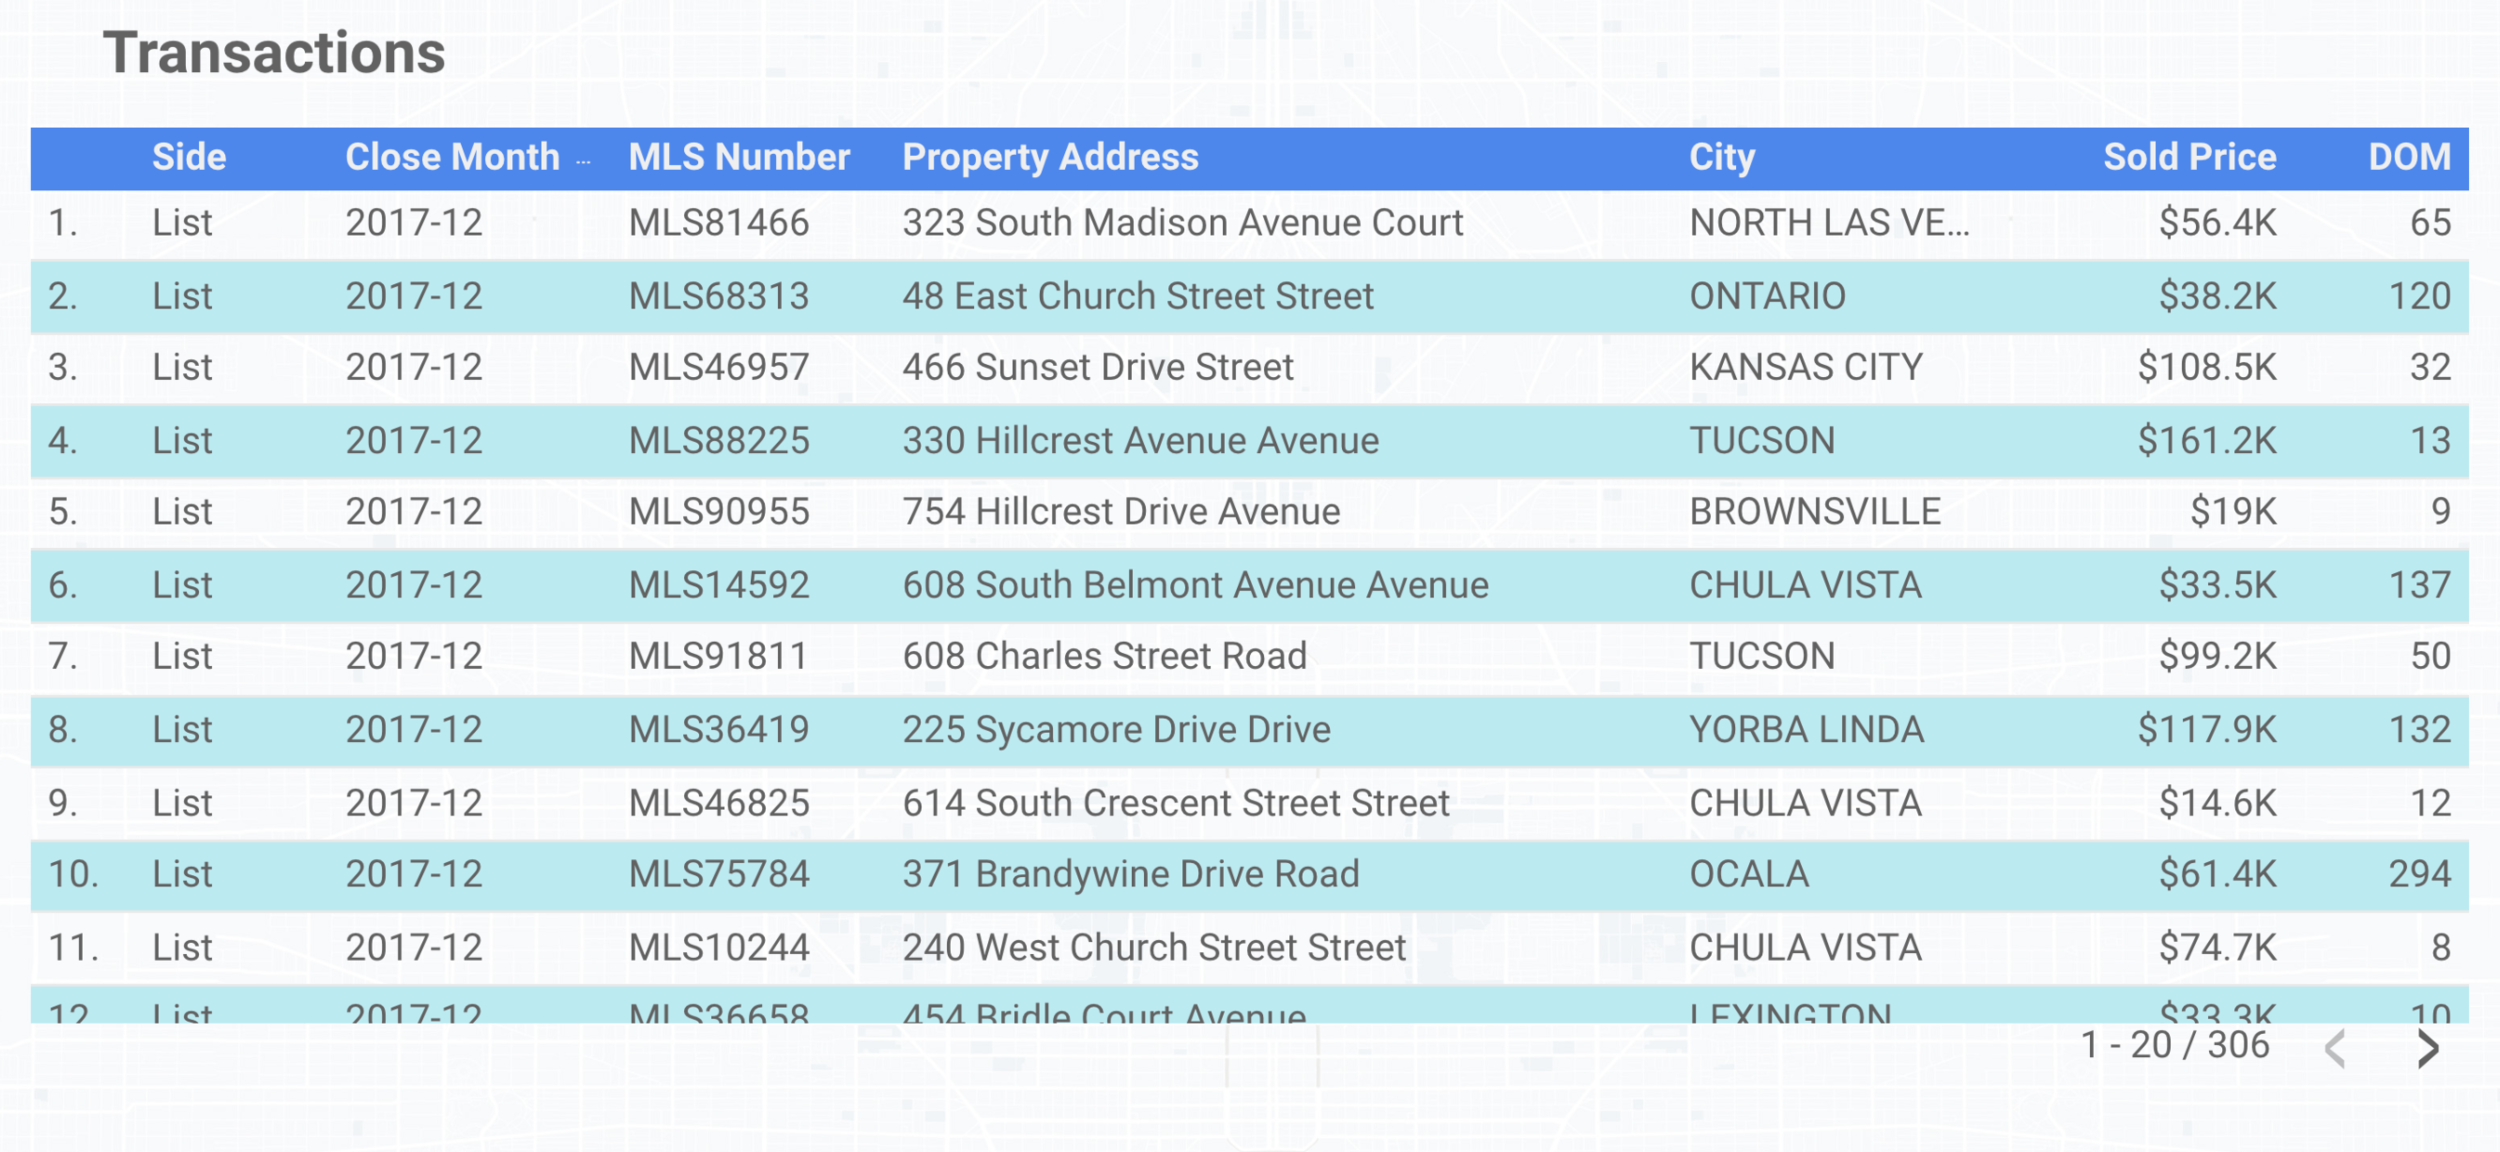 Agent Transactions List